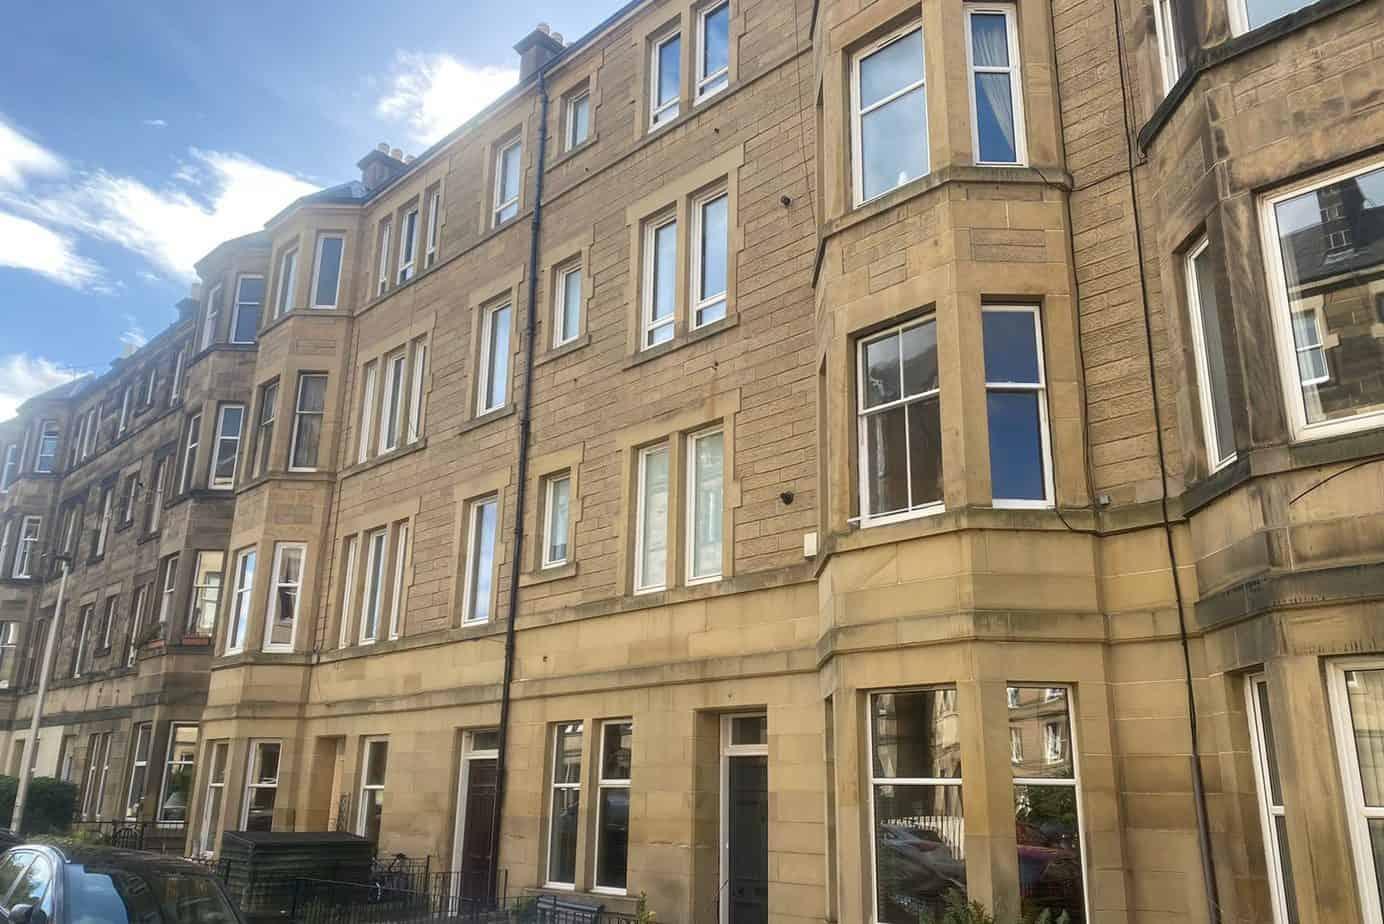 6/5 Ogilvie Terrace, Edinburgh, EH11 1NR